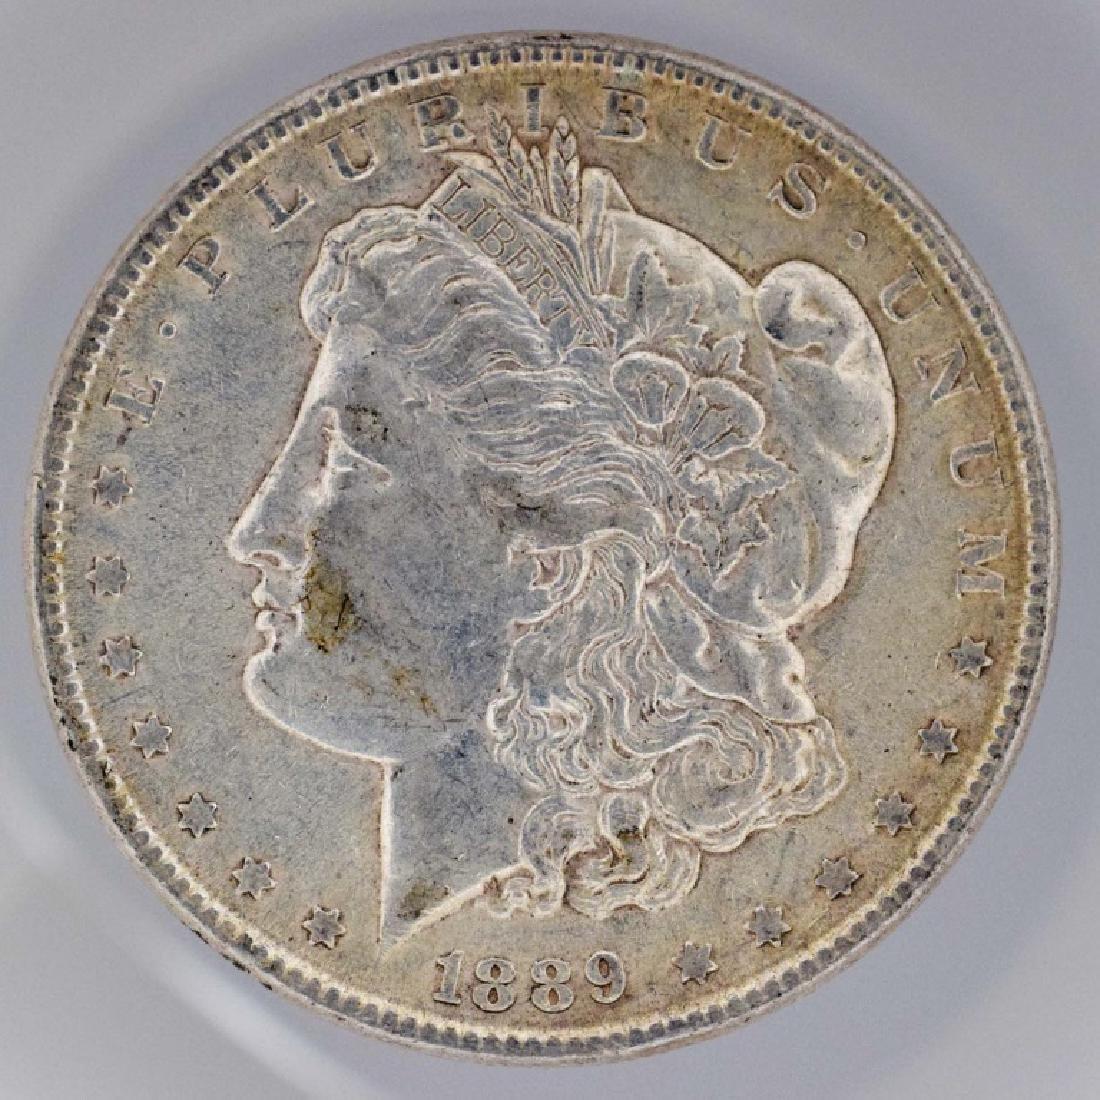 1889 Morgan Silver Dollar 1889 Philadelphia mint